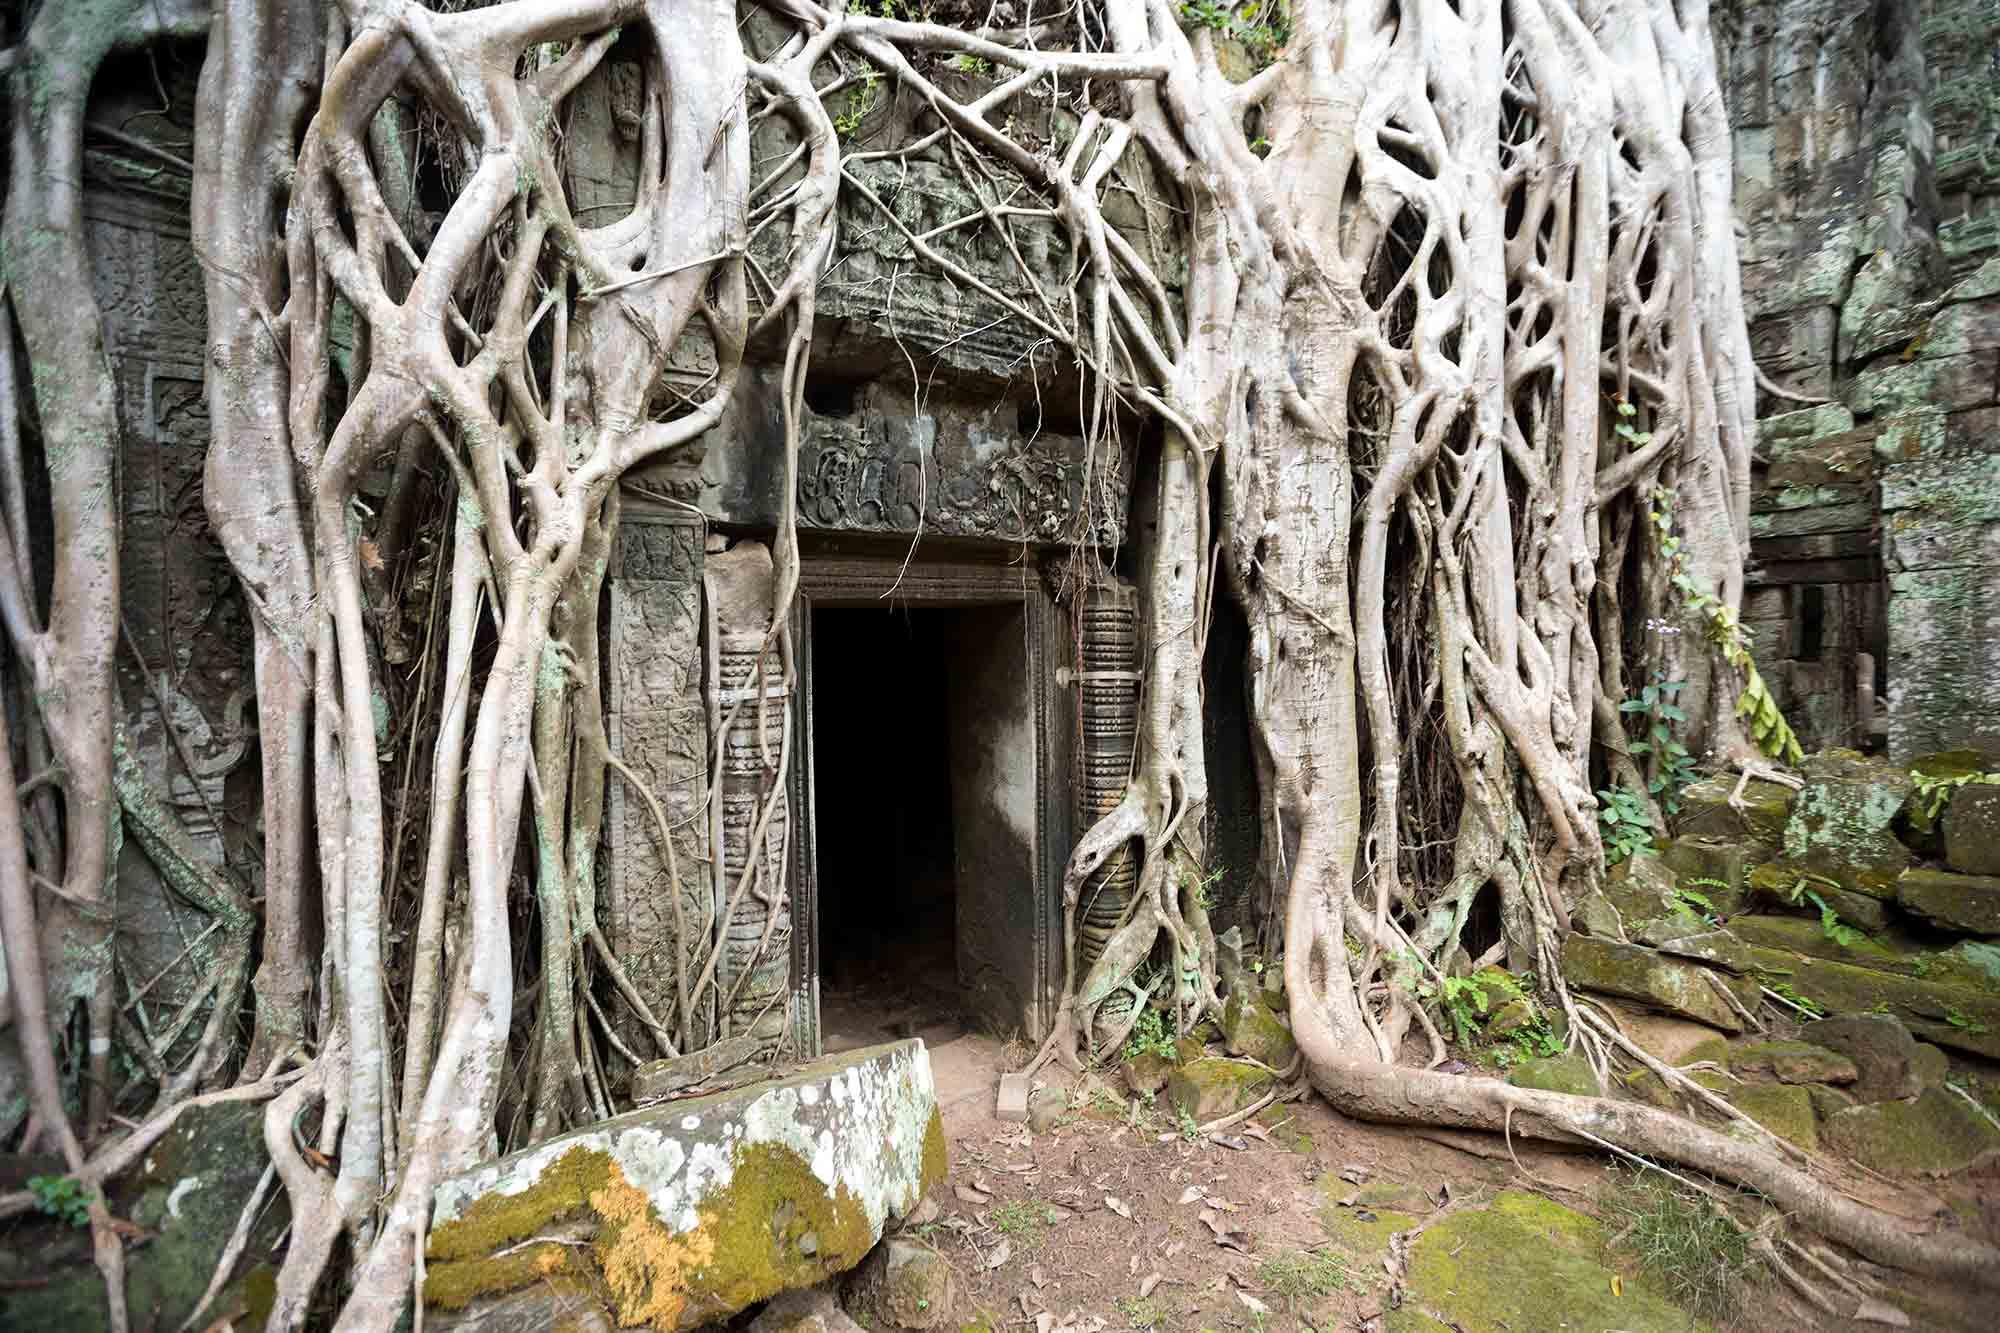 ta-Prohm-temple-angkor-wat-cambodia